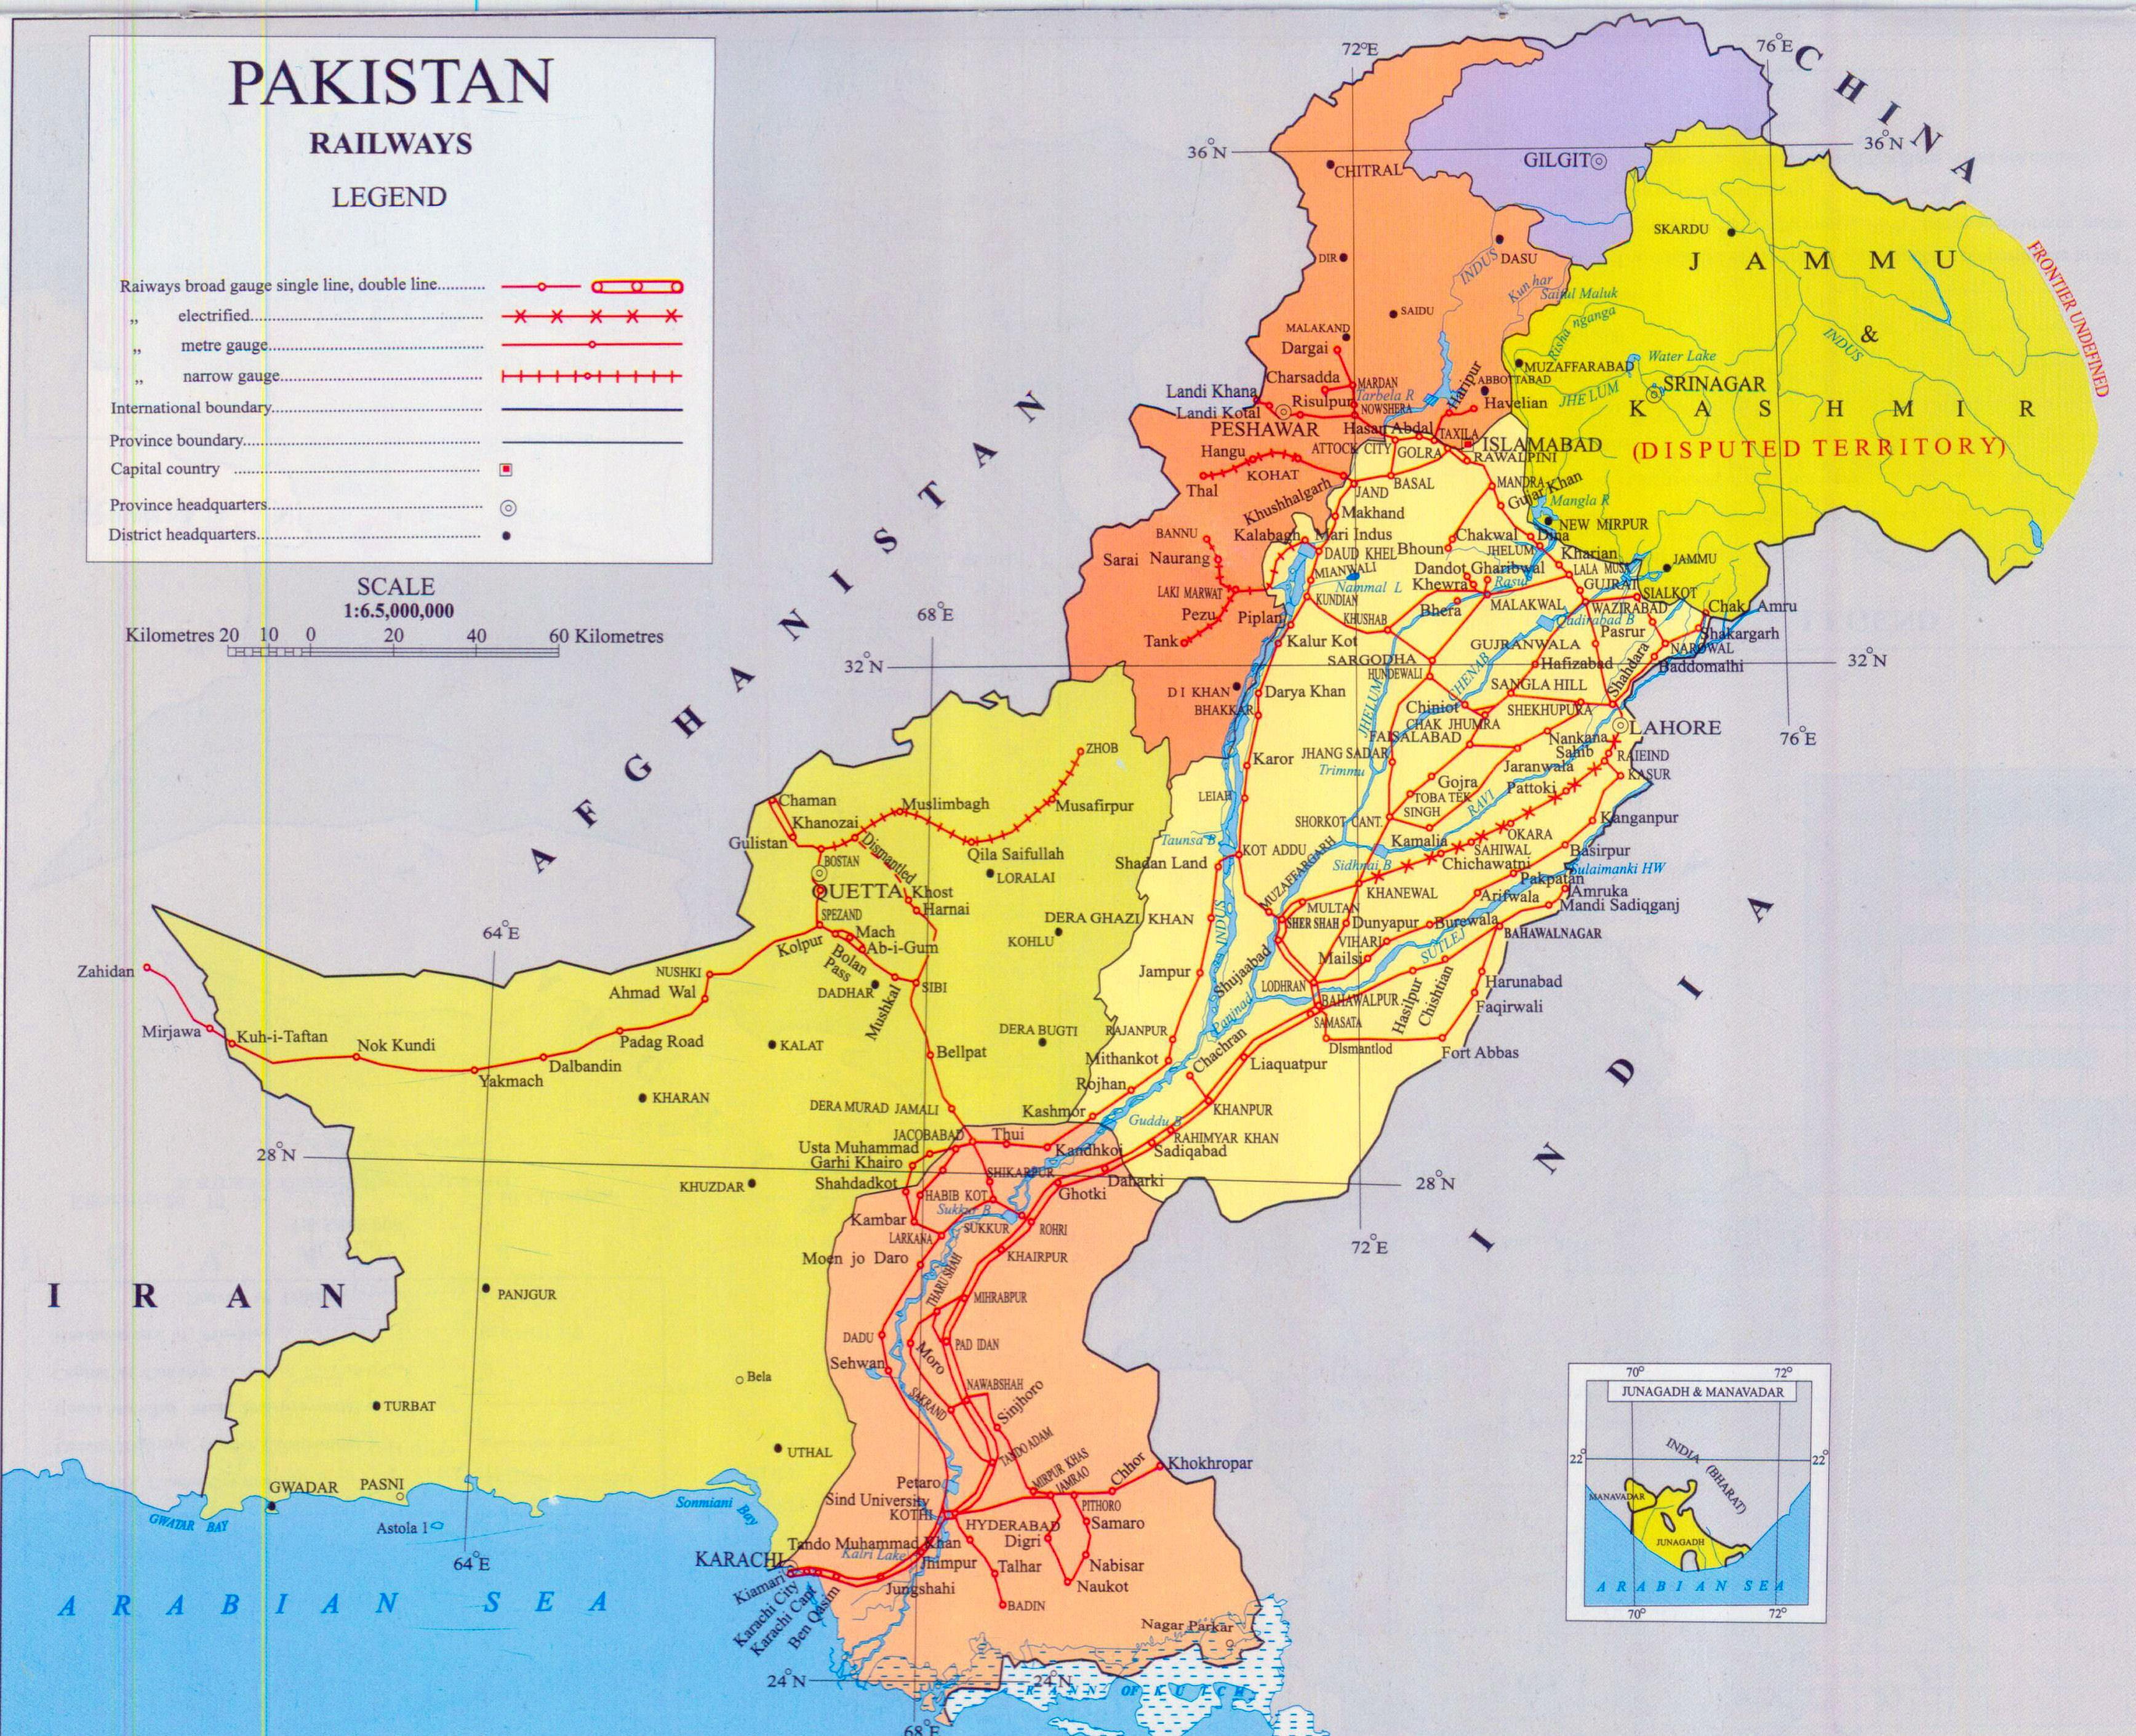 Maps of pakistan detailed map of pakistan in english tourist large detailed railways map of pakistan gumiabroncs Choice Image